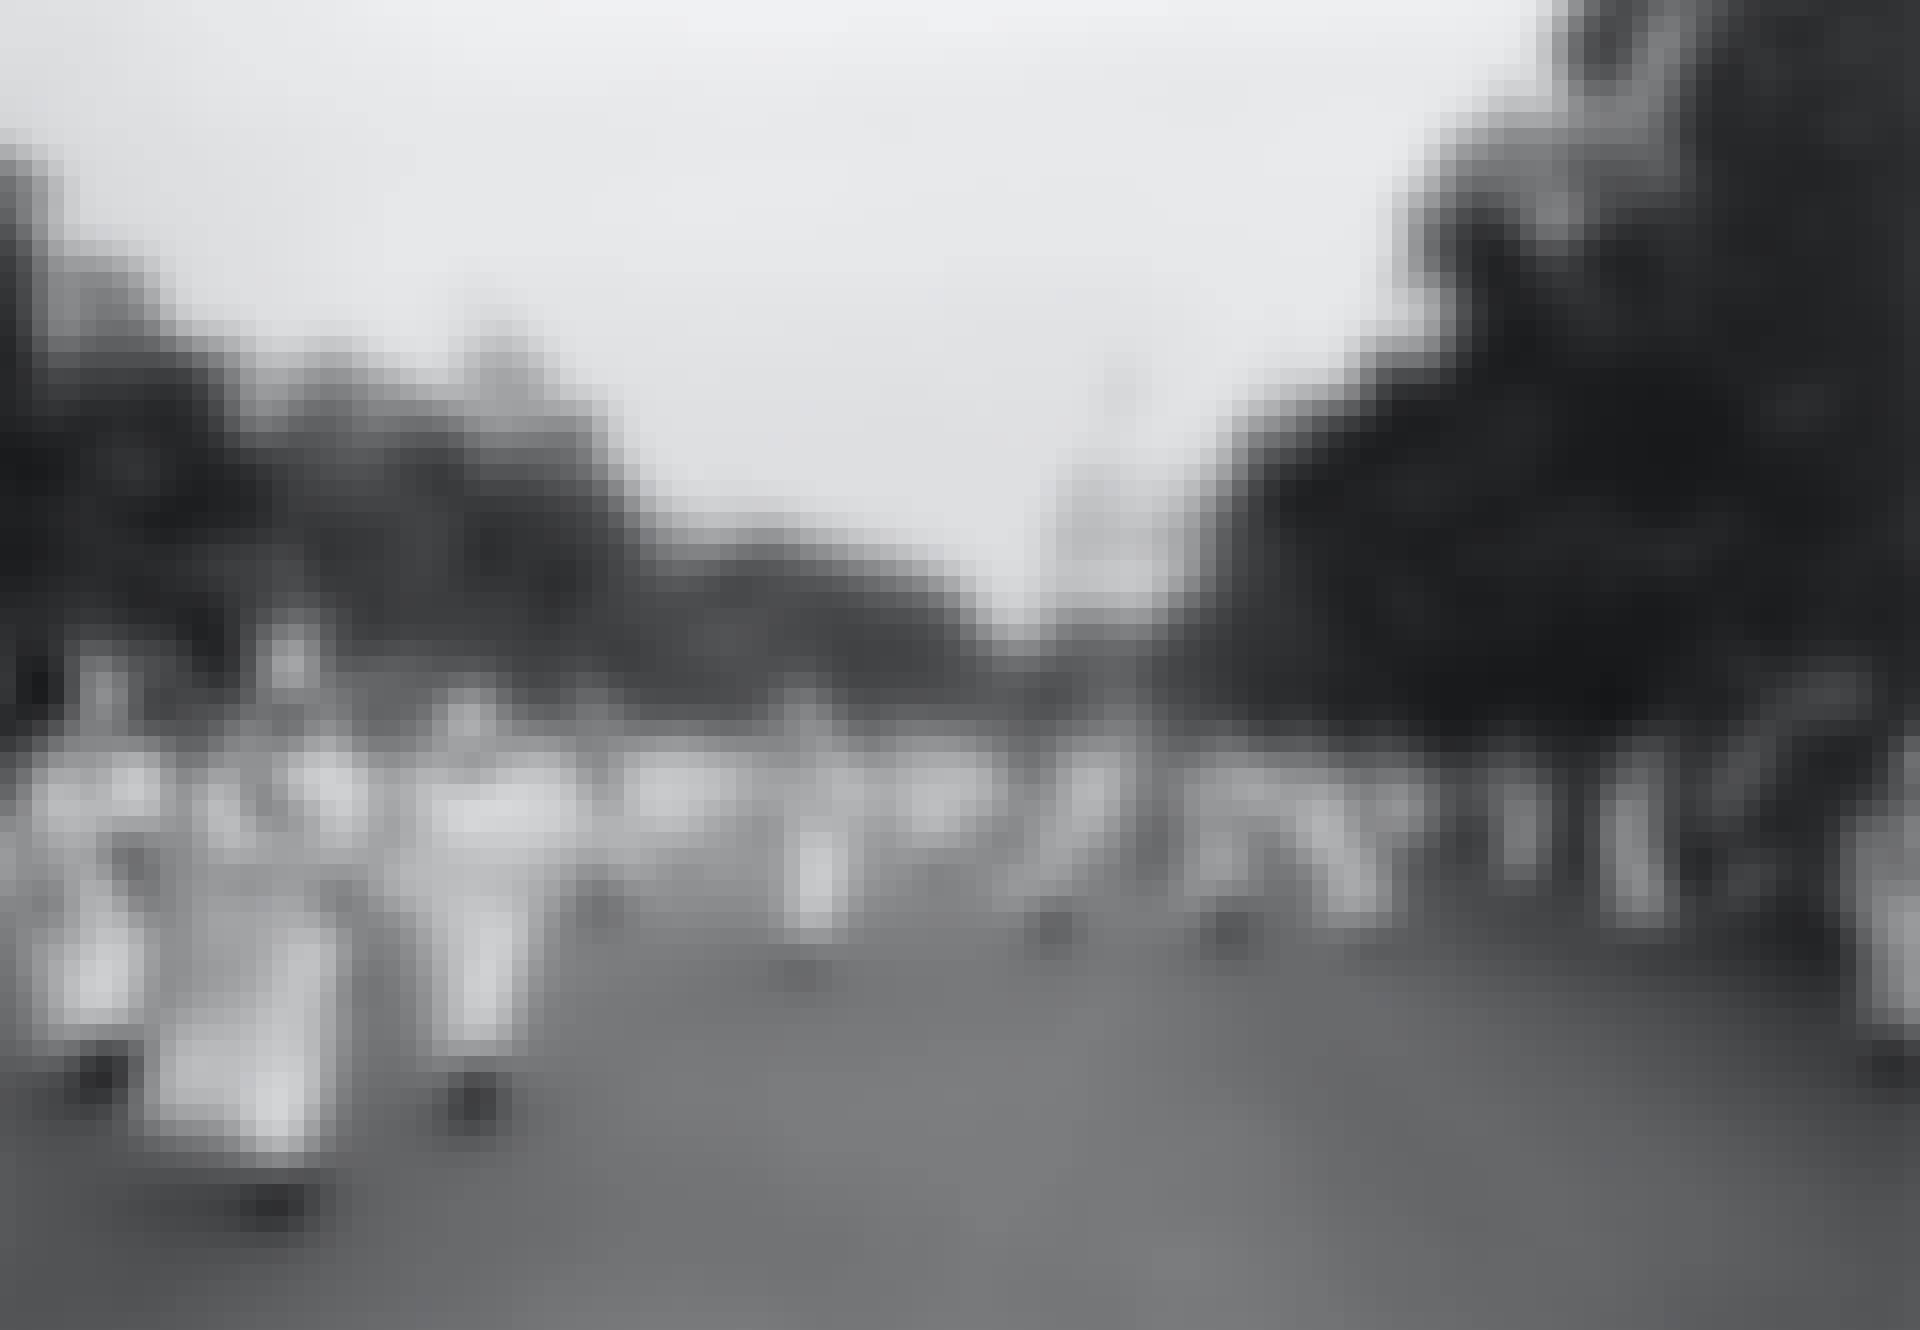 Ku Klux Klan marching down Pennsylvania Avenue in Washington DC on 13th September 1926